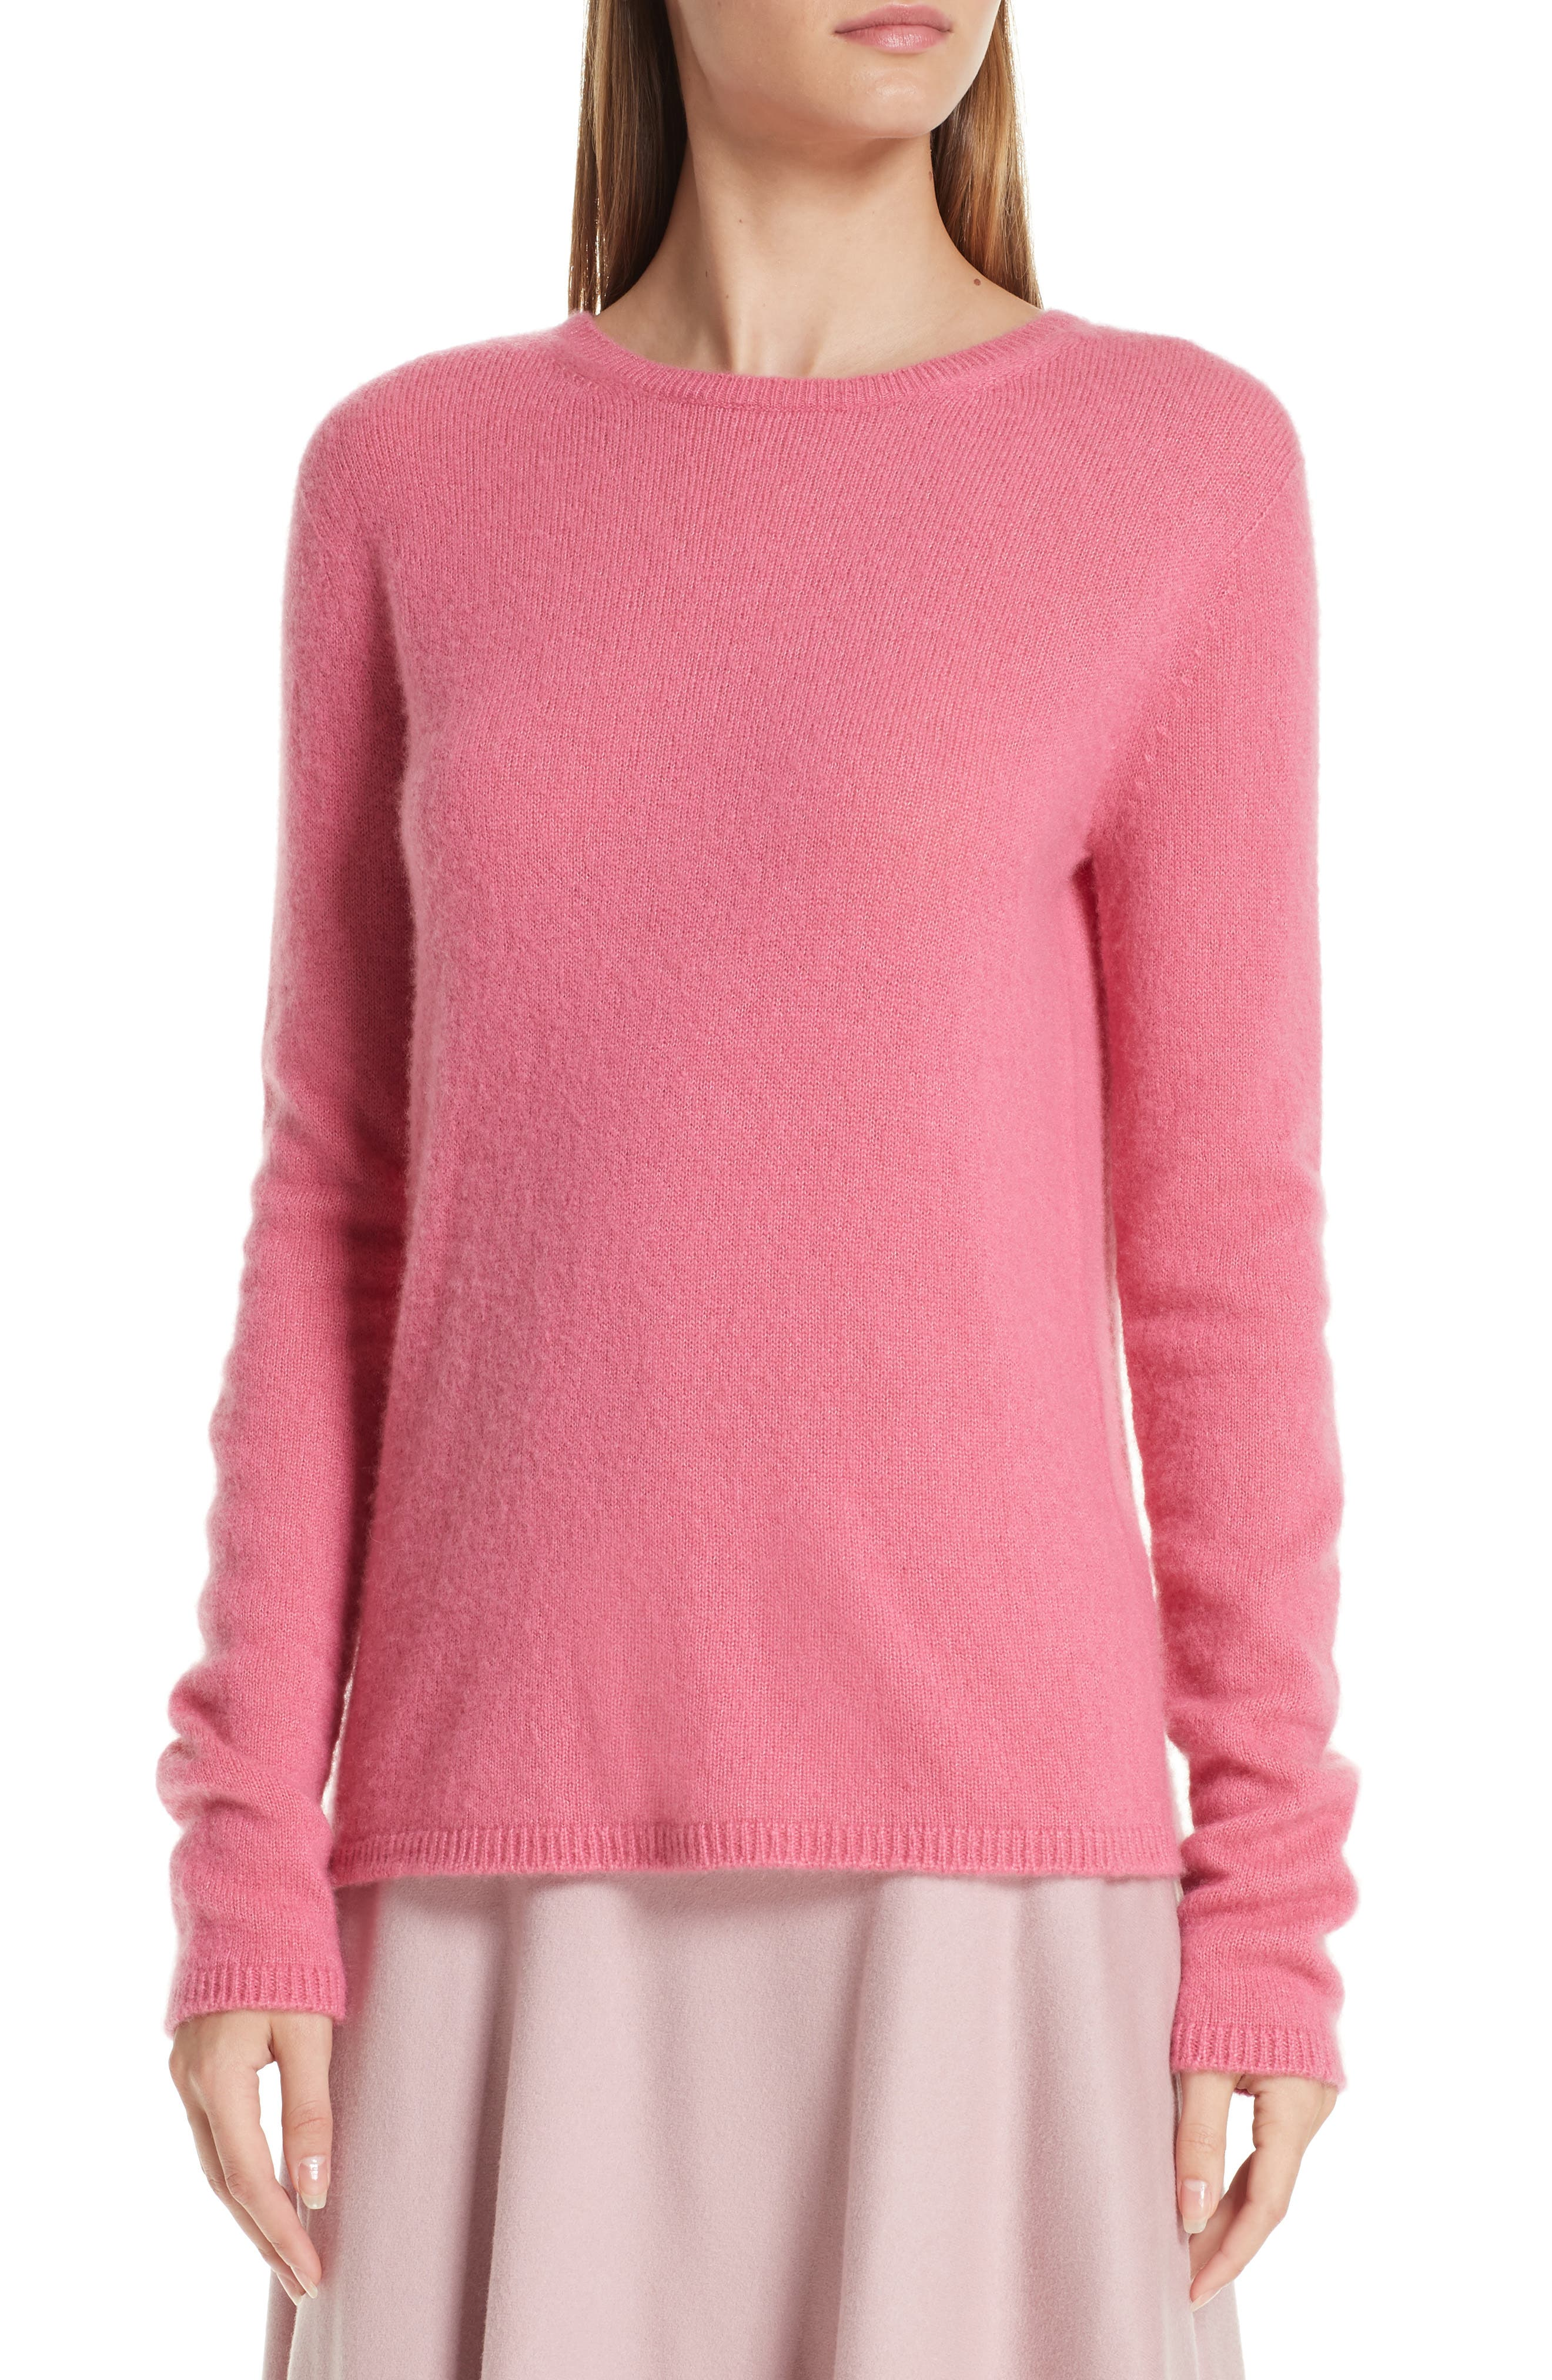 MAX MARA, Stelvio Cashmere & Silk Sweater, Alternate thumbnail 4, color, 672